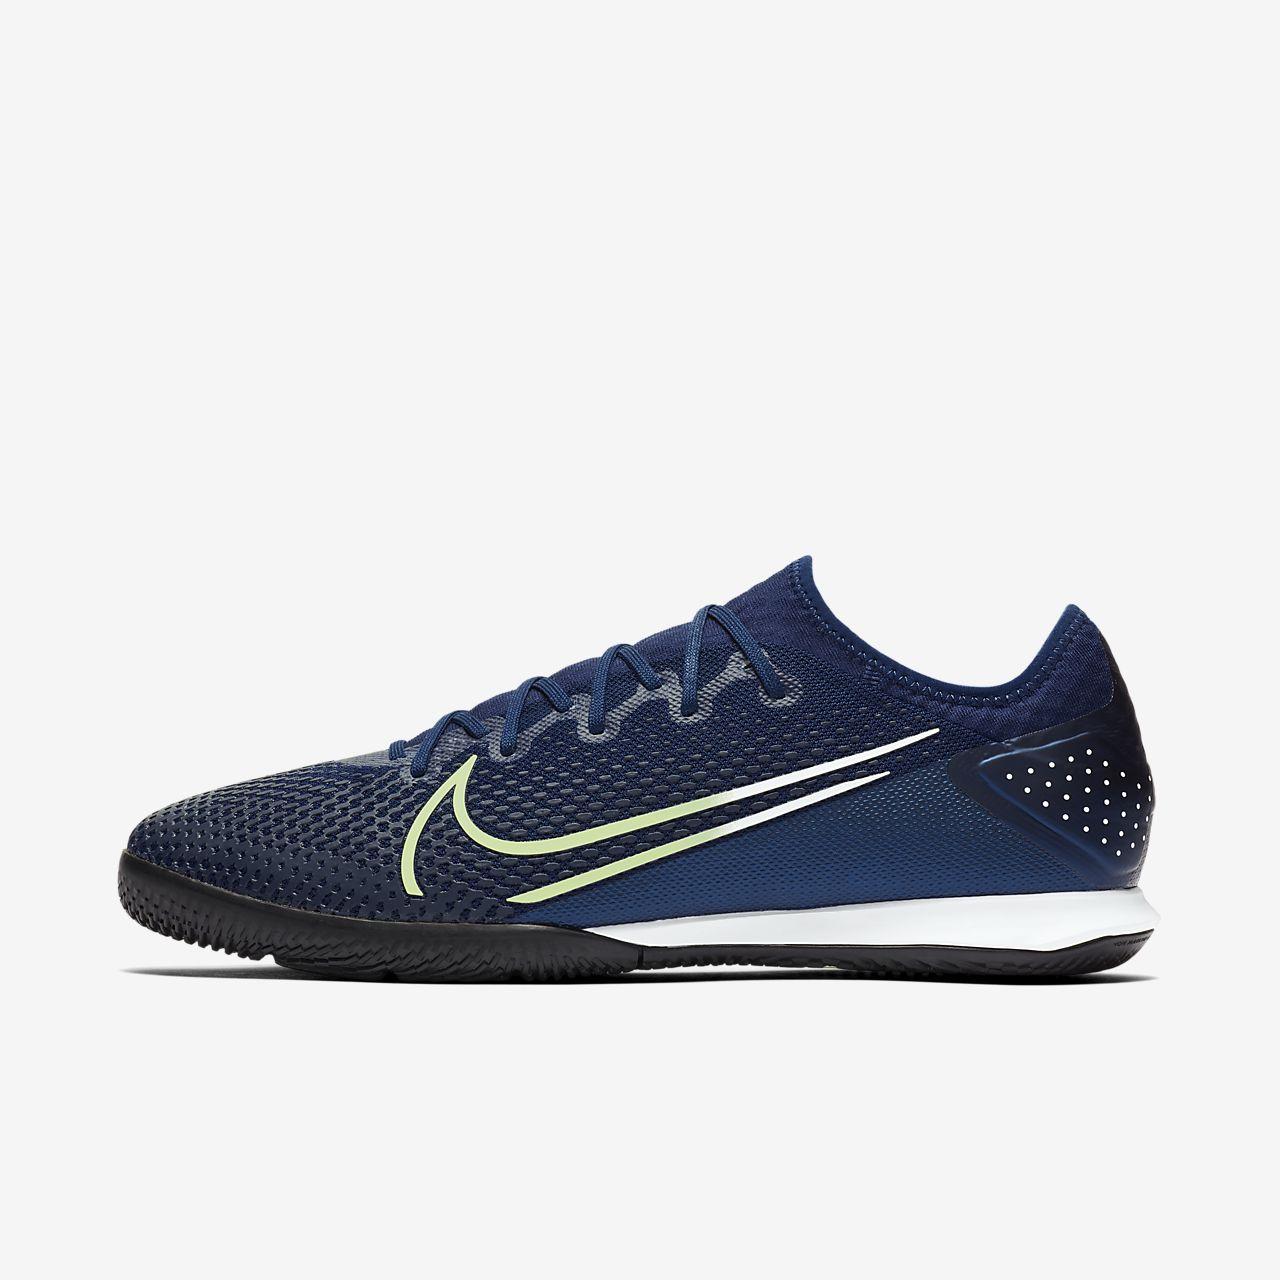 Chaussure de football en salle Nike Mercurial Vapor 13 Pro MDS IC